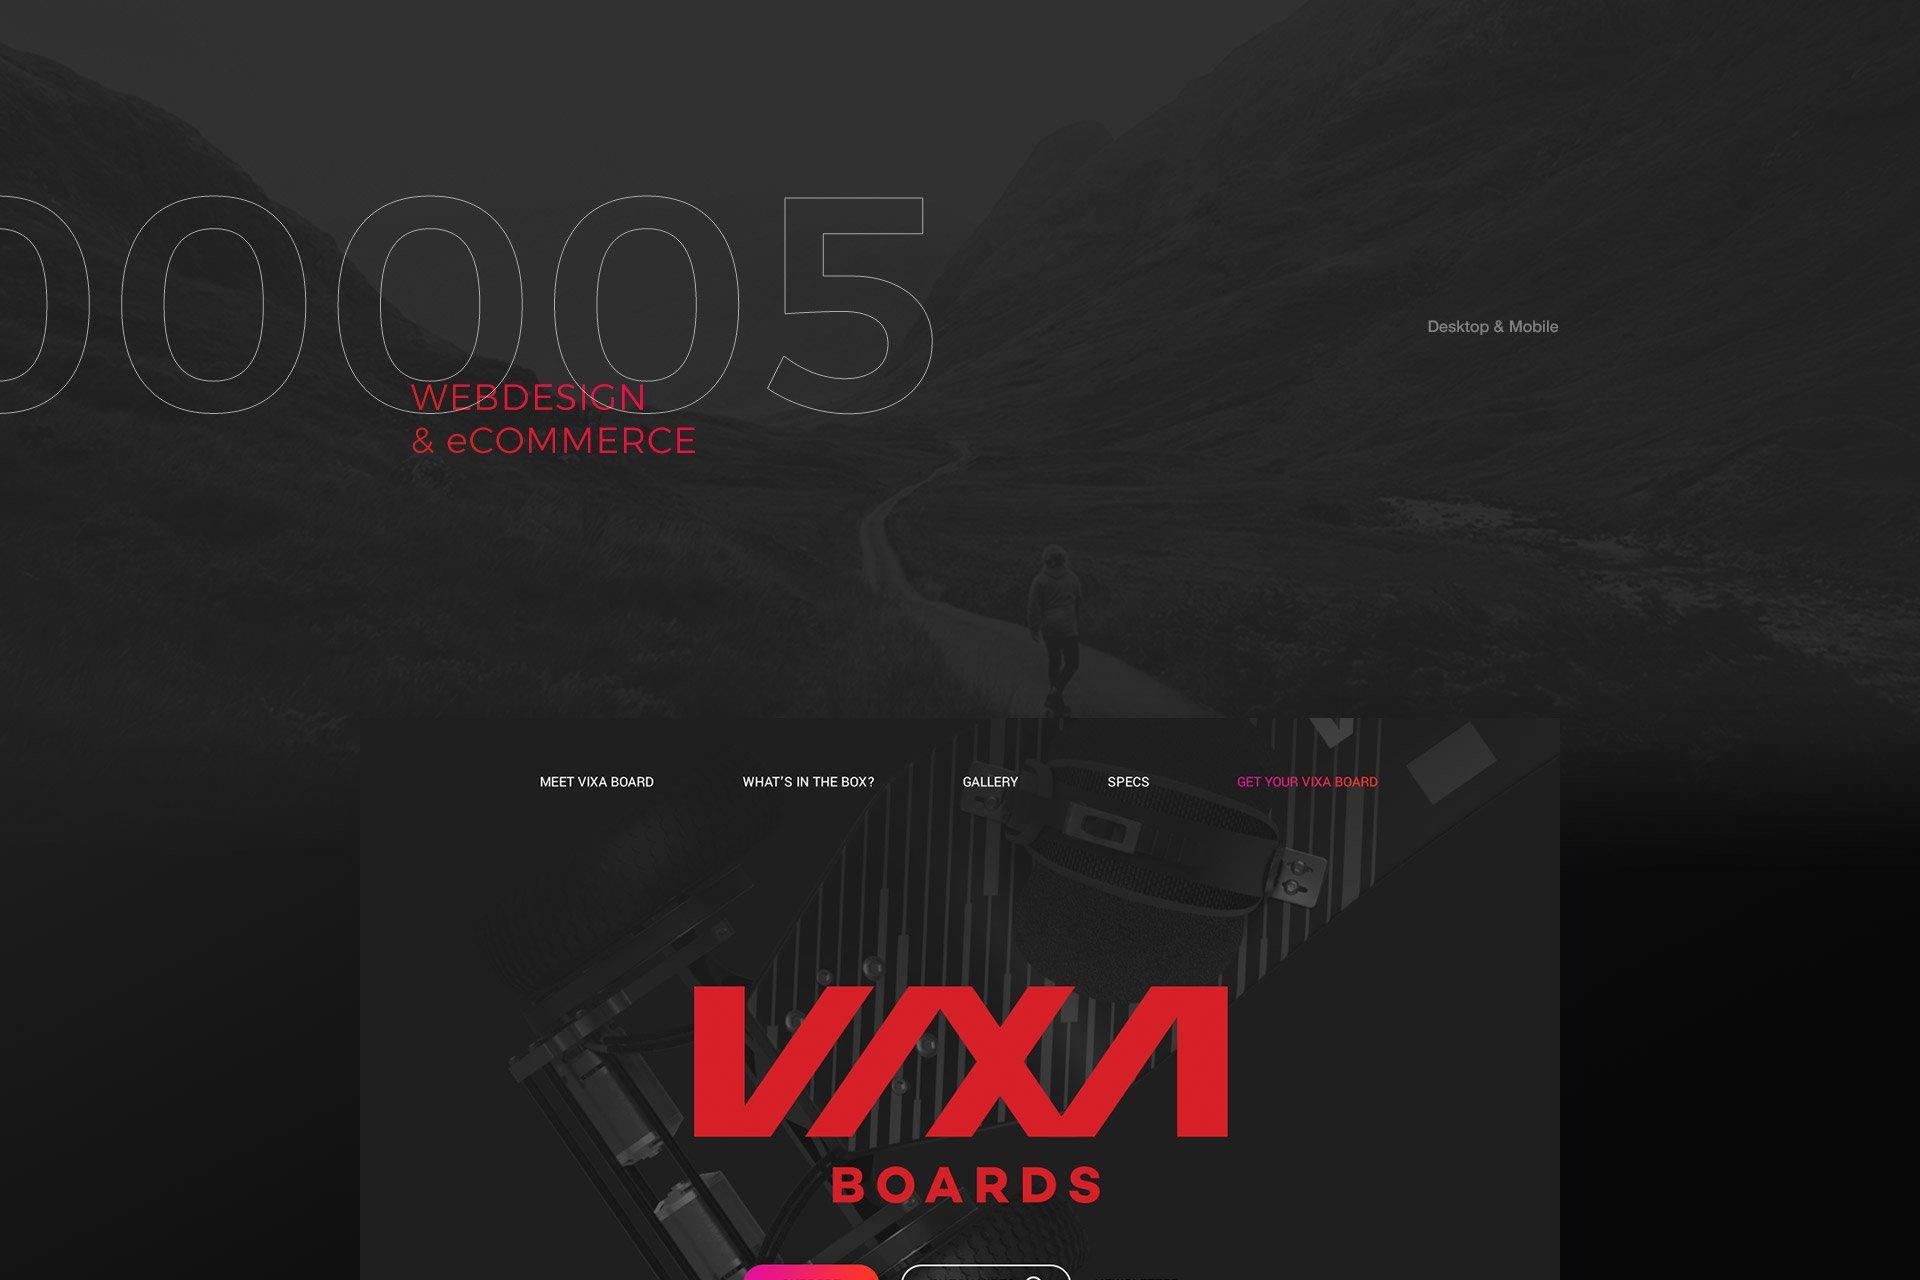 Vixa Boards